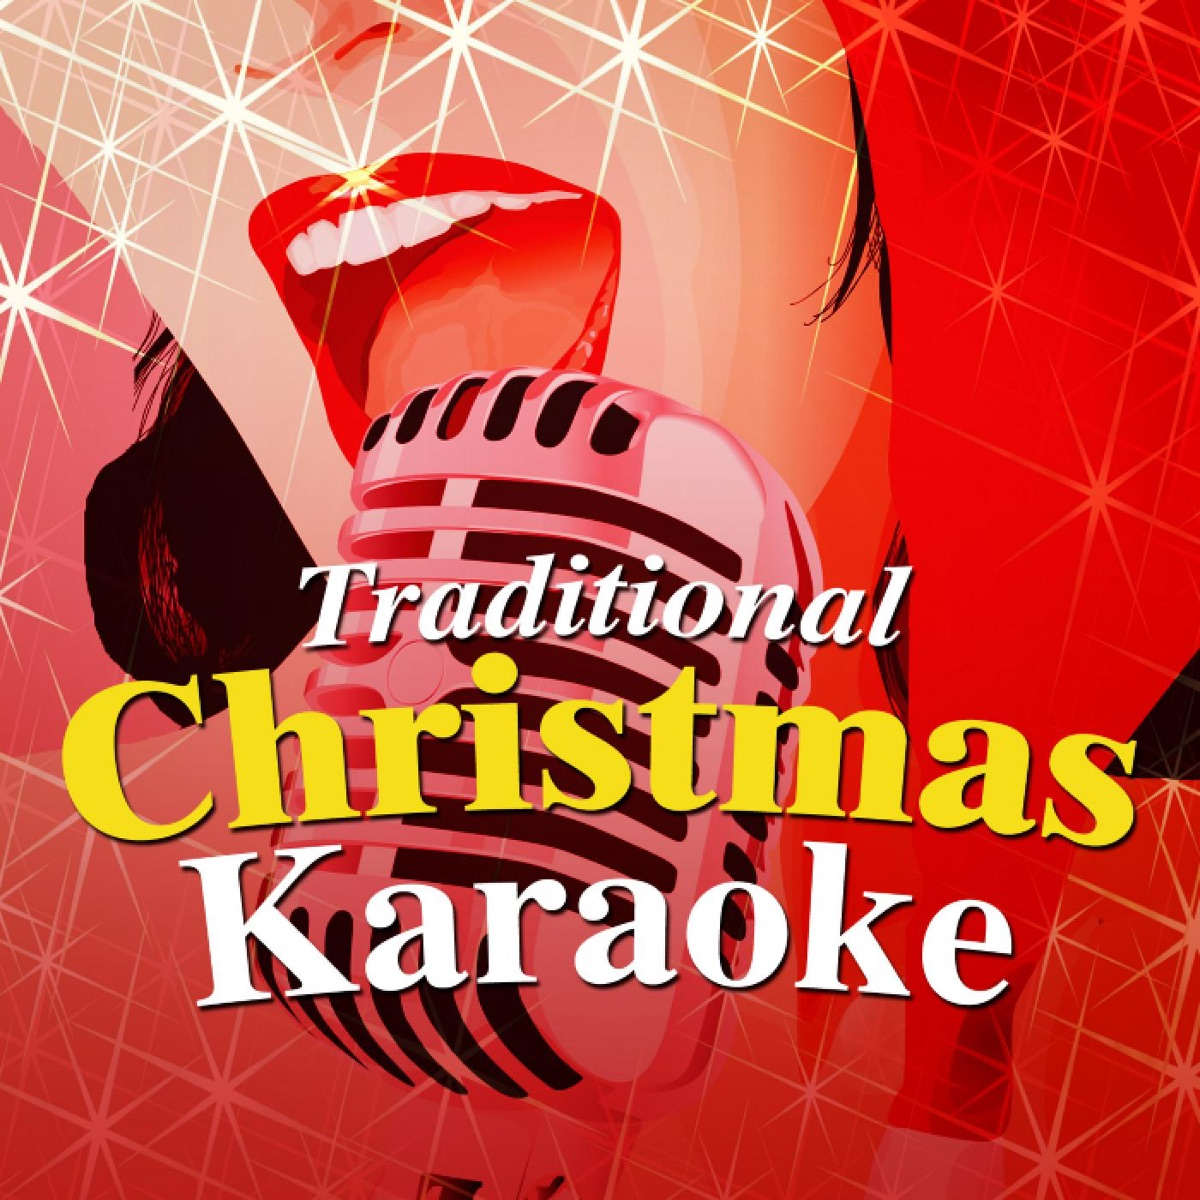 Christmas Karaoke Cd.Traditional Christmas Karaoke Album Cover By Karaoke Star